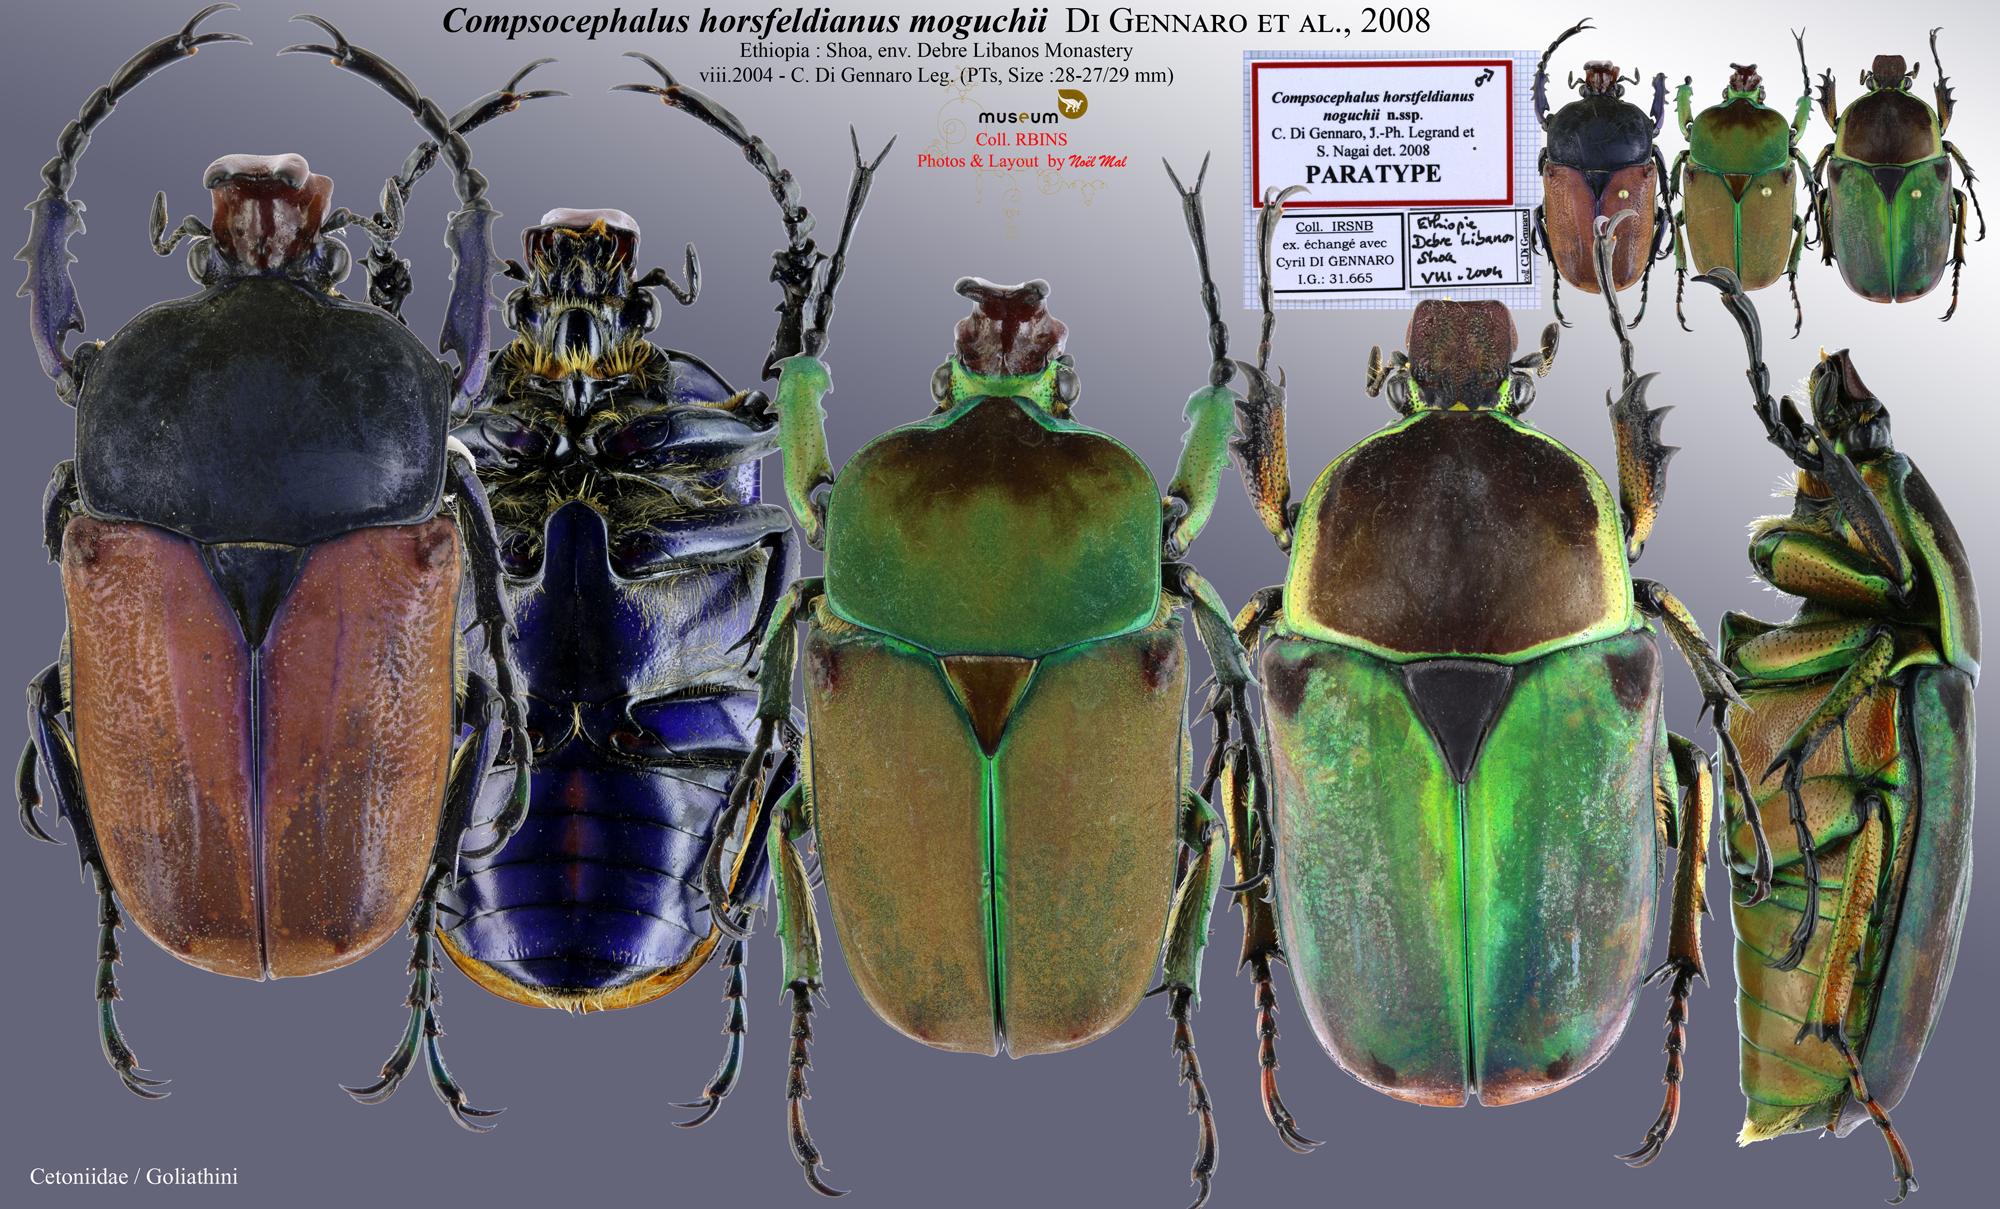 Compsocephalus horsfieldianus noguchii PT .jpg